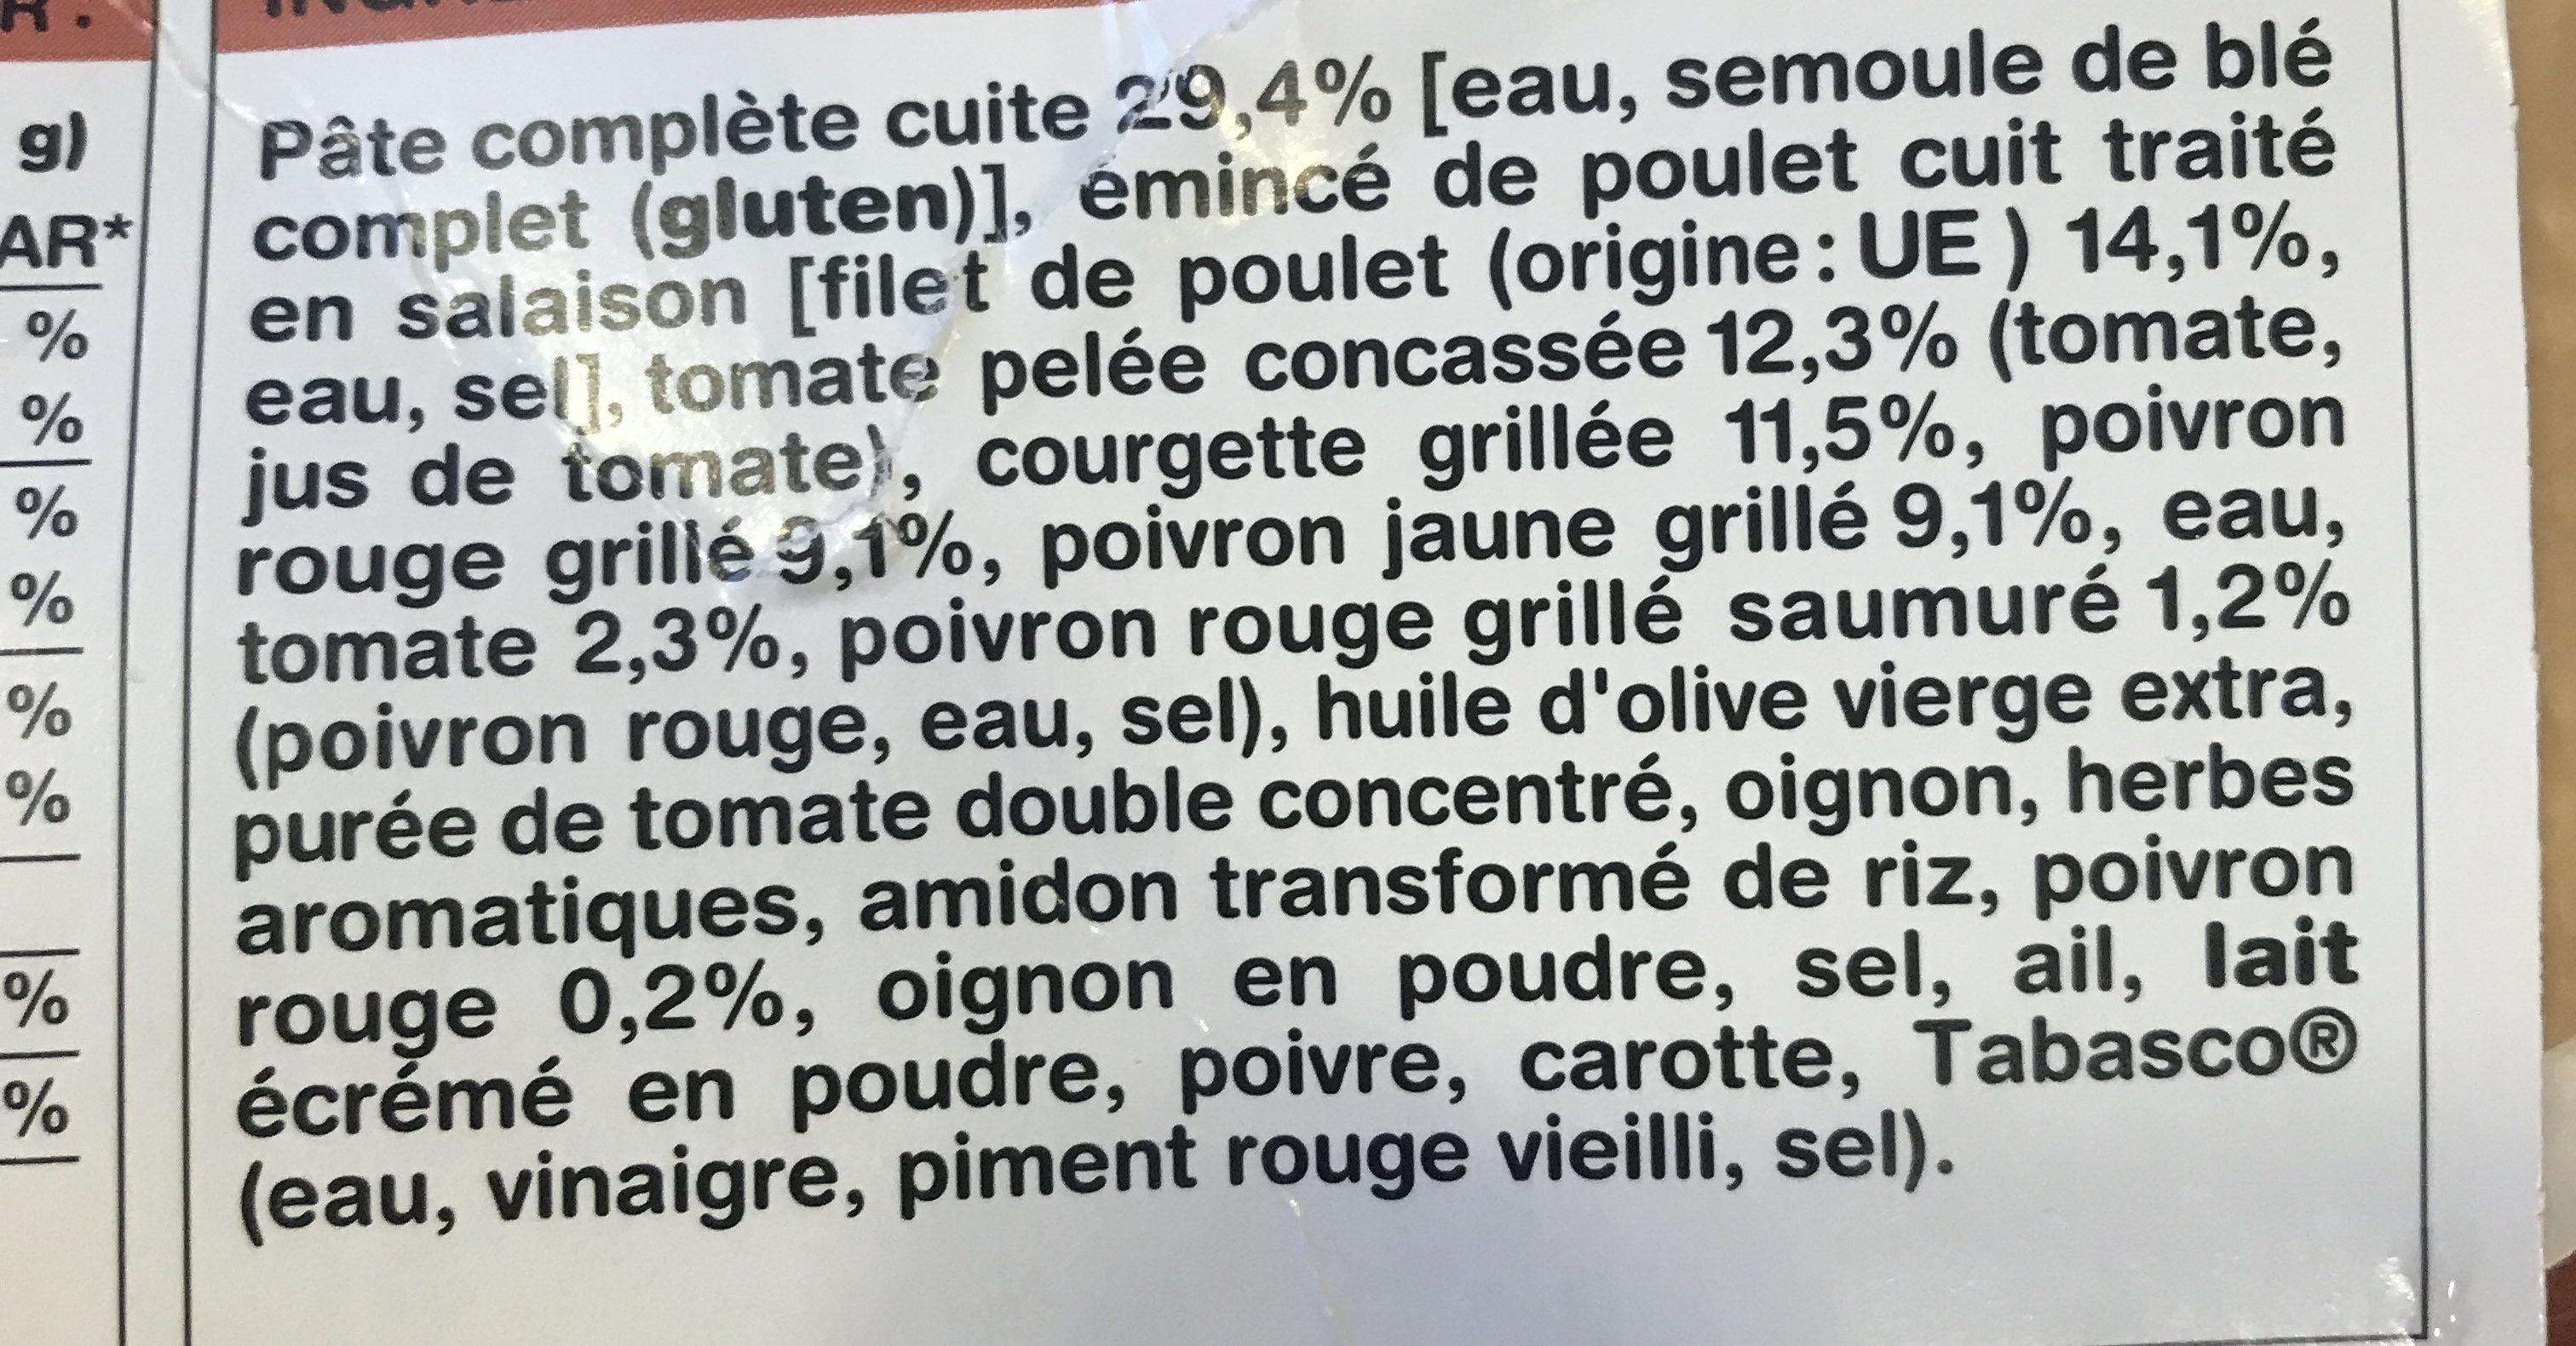 Emincés de poulet, Surgelés (1,6 % MG) - Ingrediënten